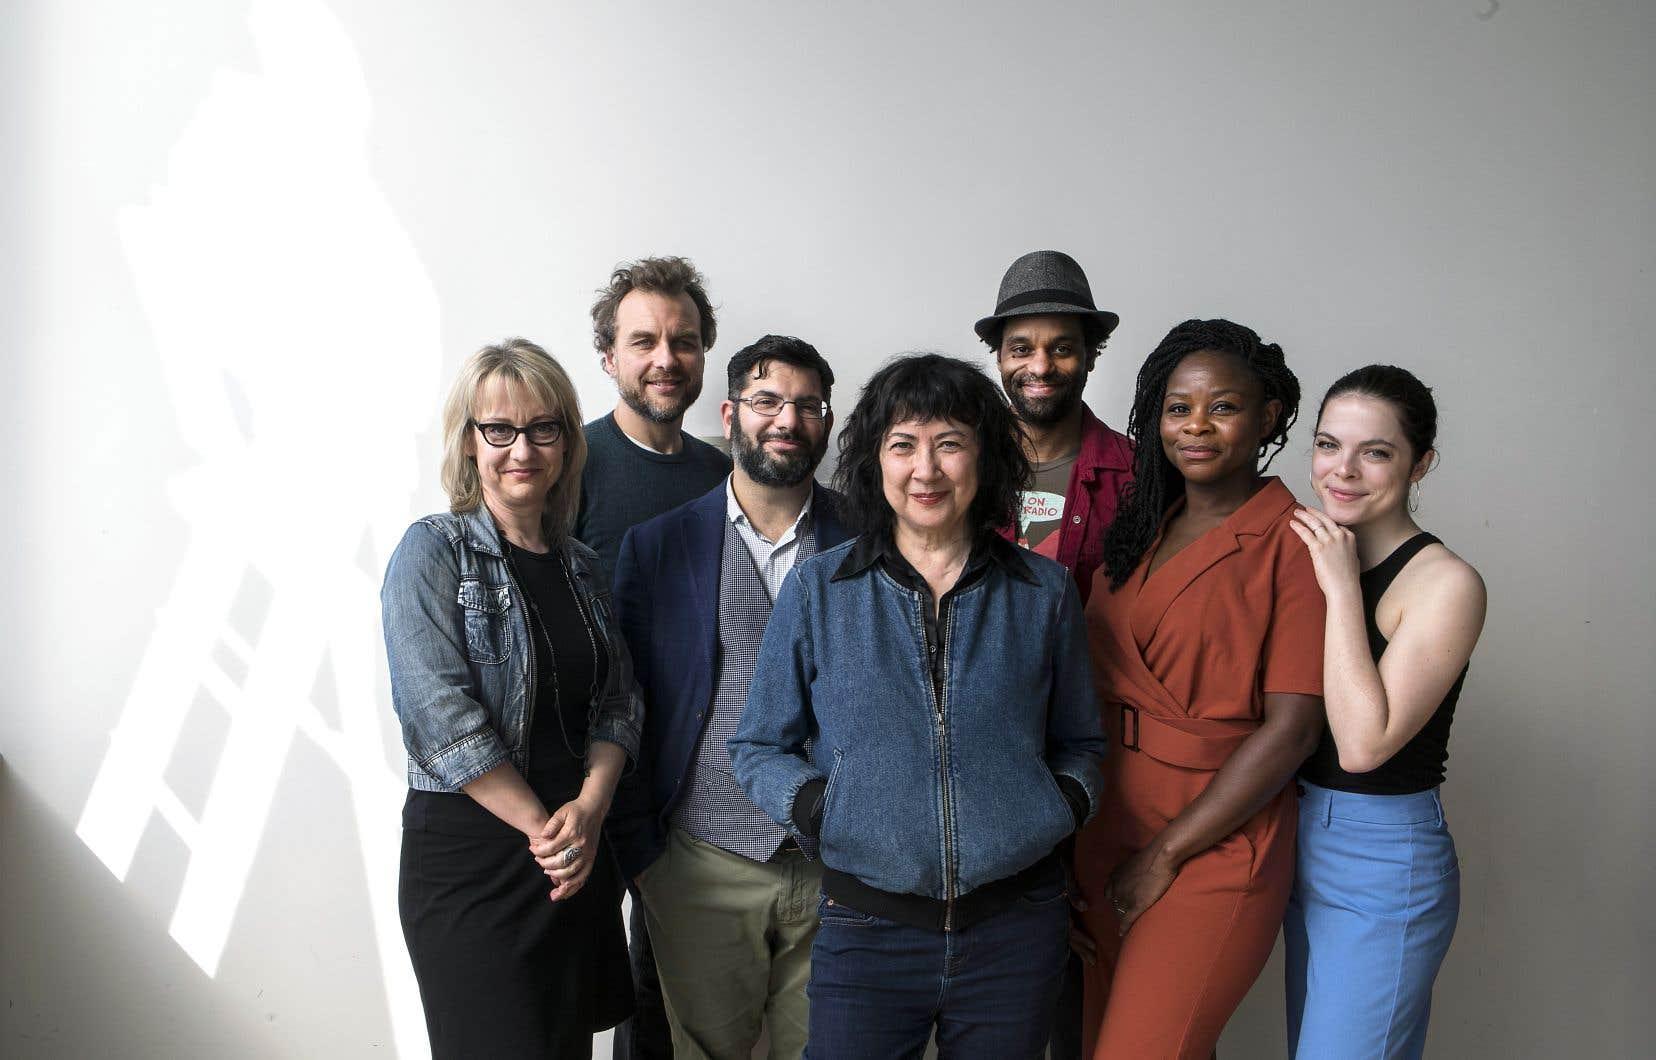 Nathalie Mallette, Patrice Dubois, Olivier Kemeid, Marie Brassard, Philippe Racine, Tatiana Zinga Botao et Laetitia Isambert seront de la prochaine saison du Quat'Sous.